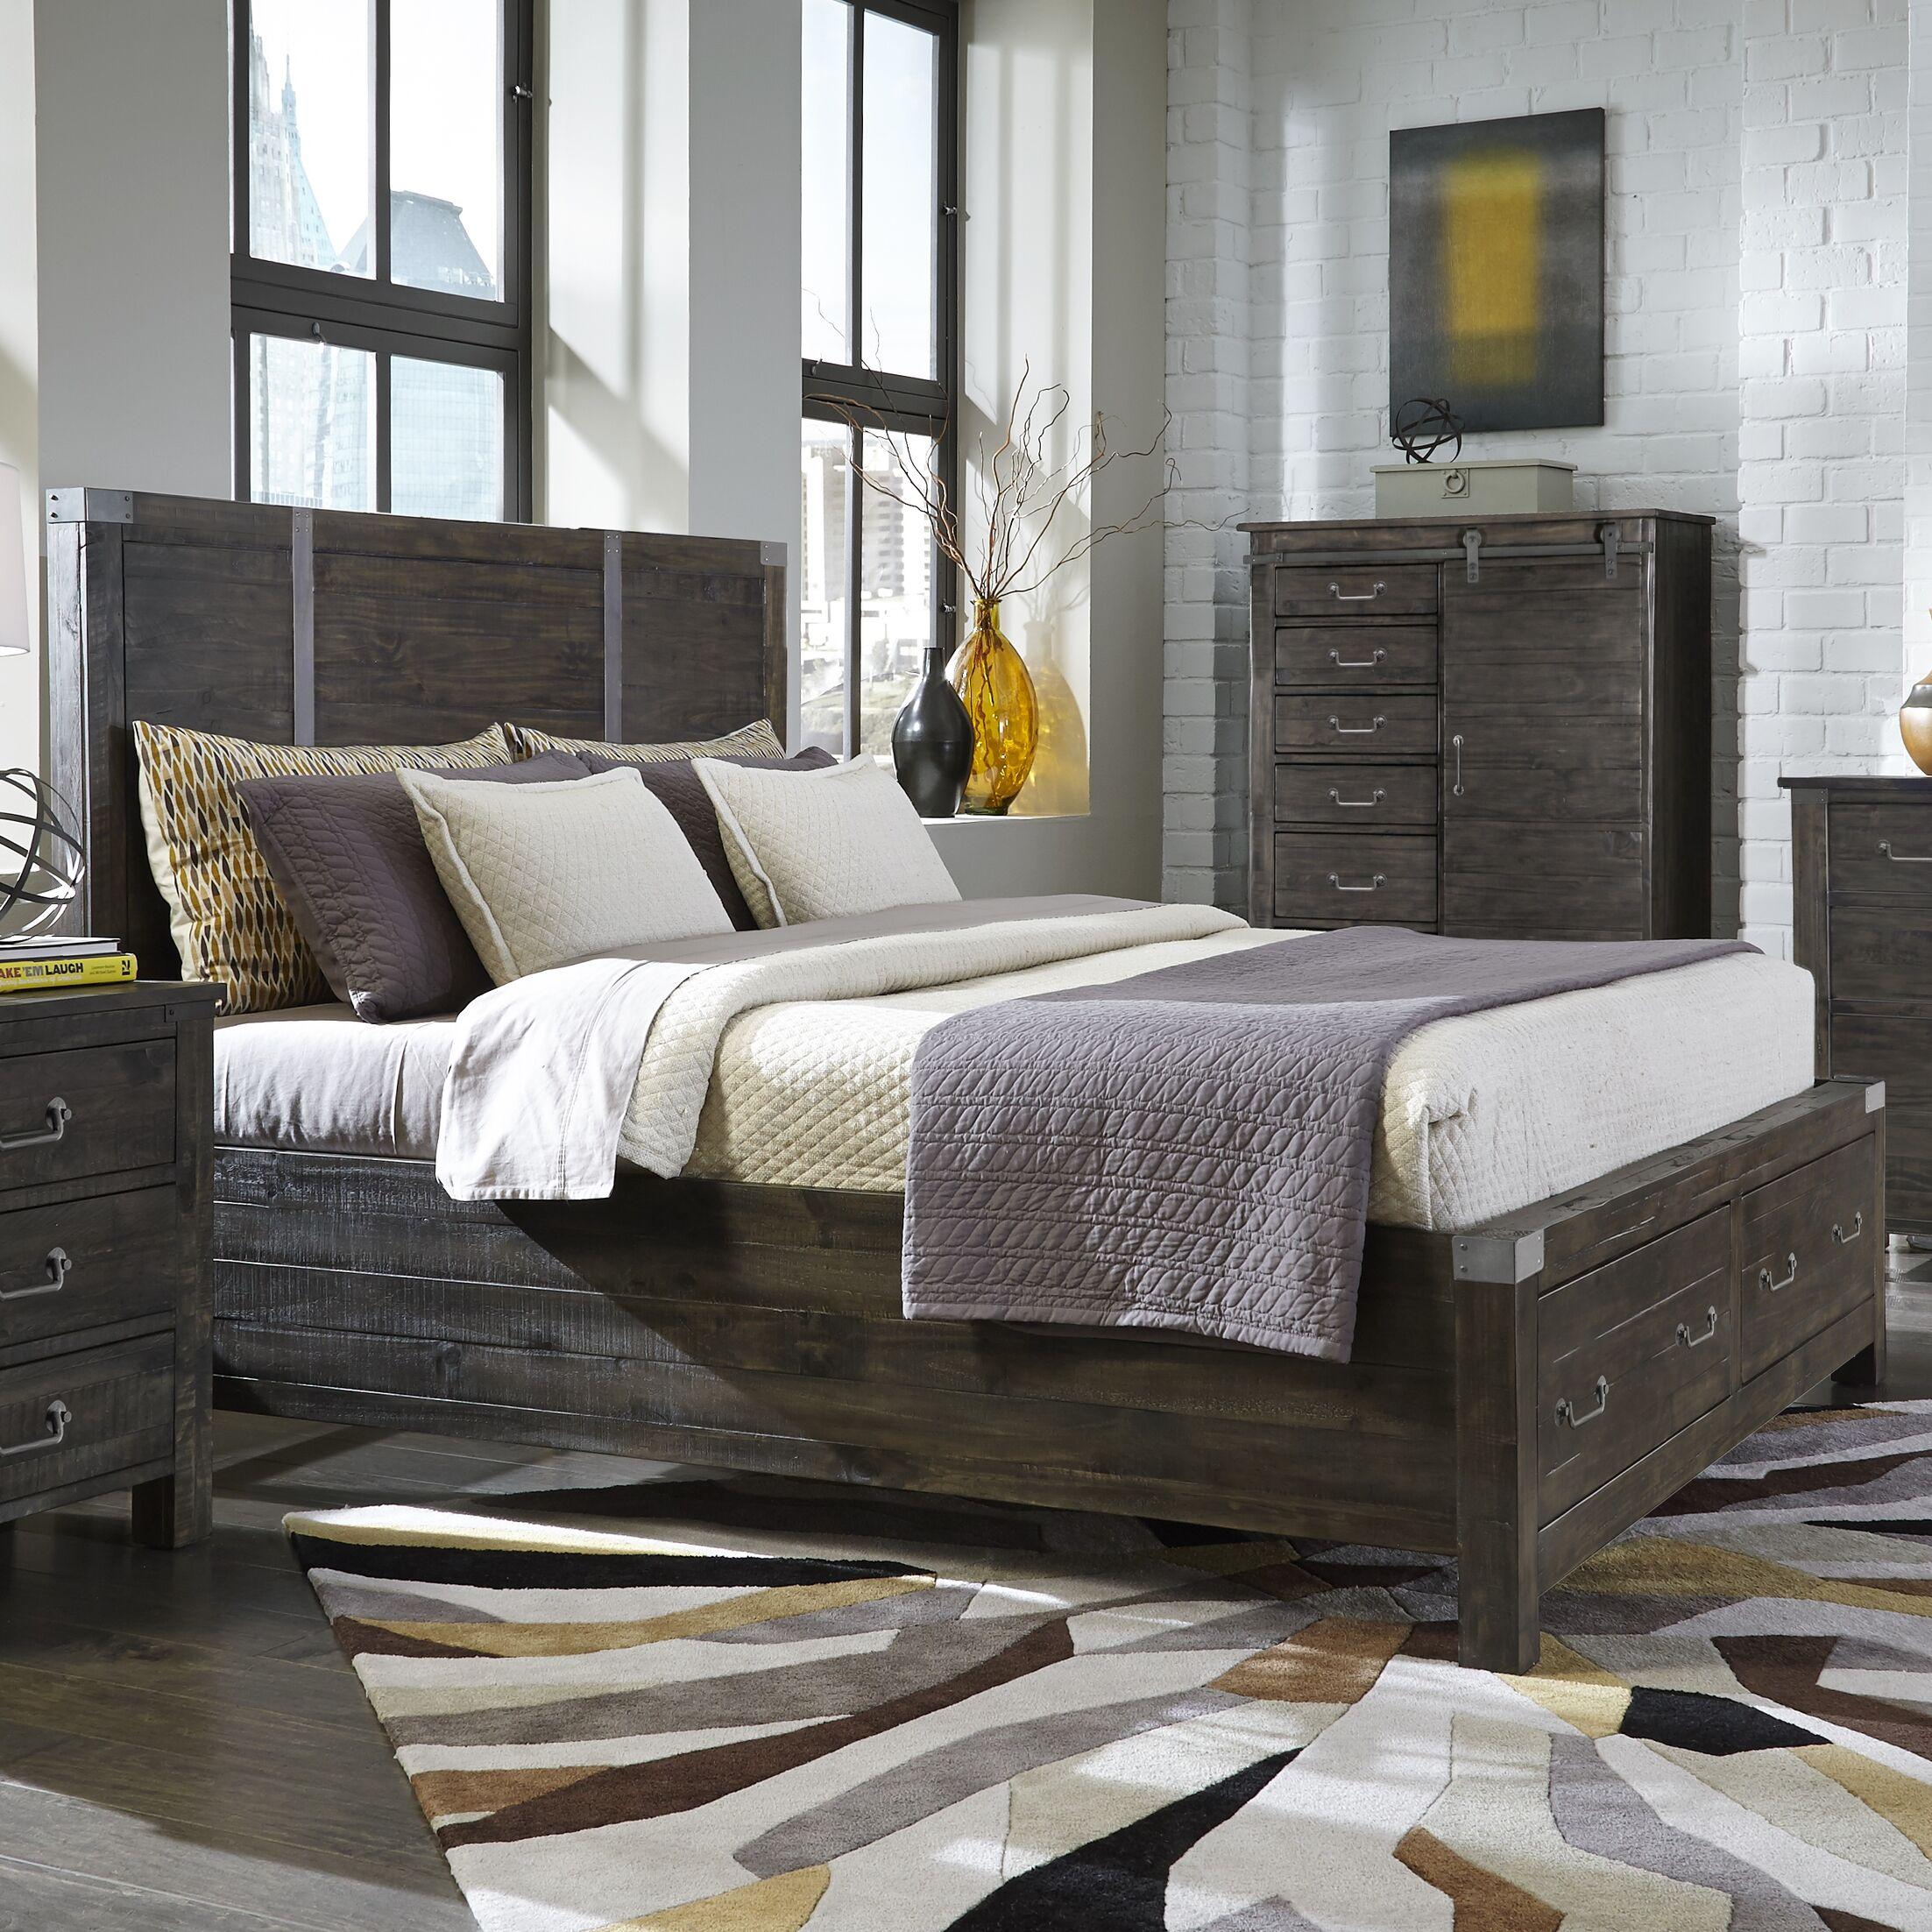 Storage Platform Bed Size: King